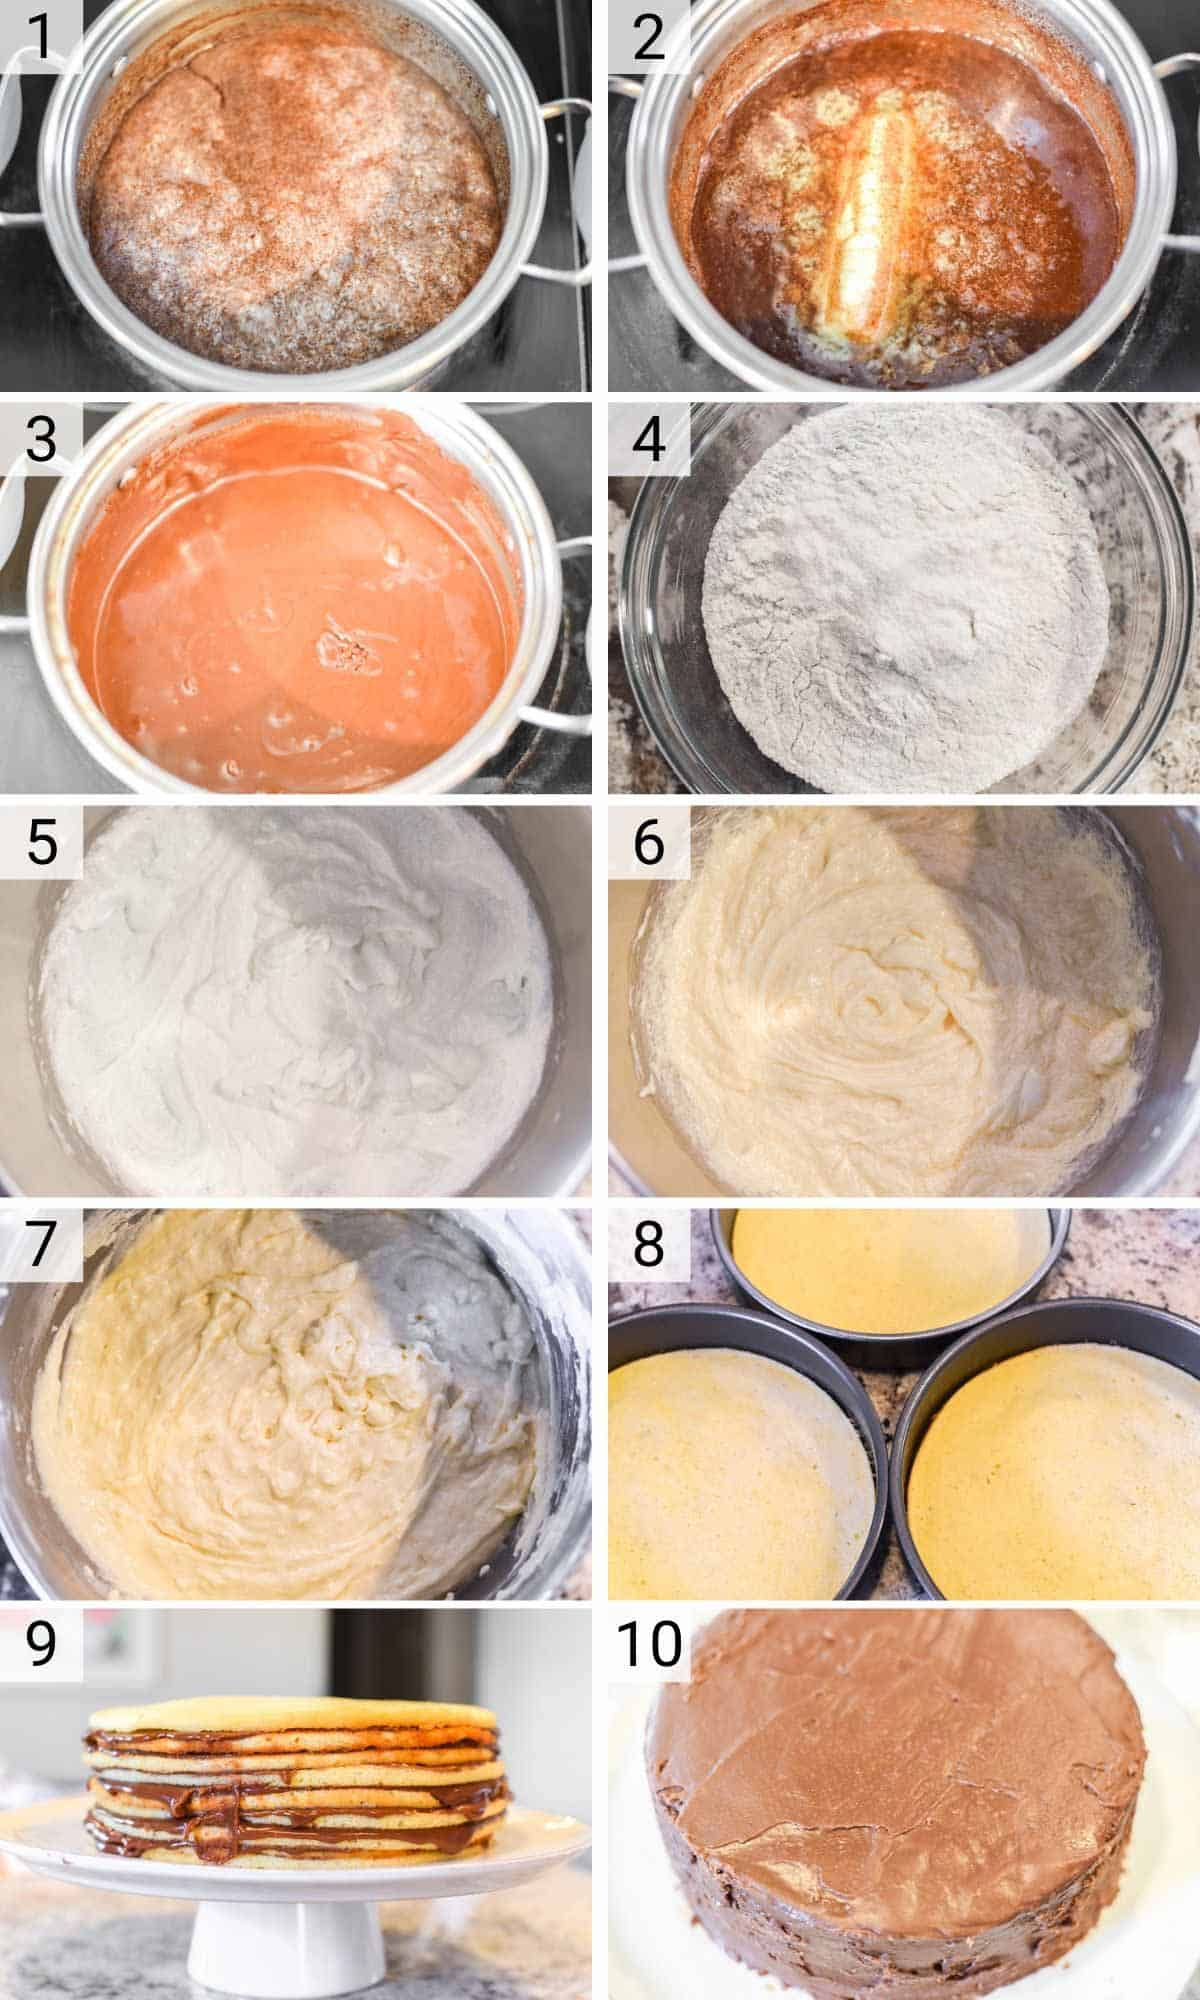 process shots of how to make a Smith Island cake